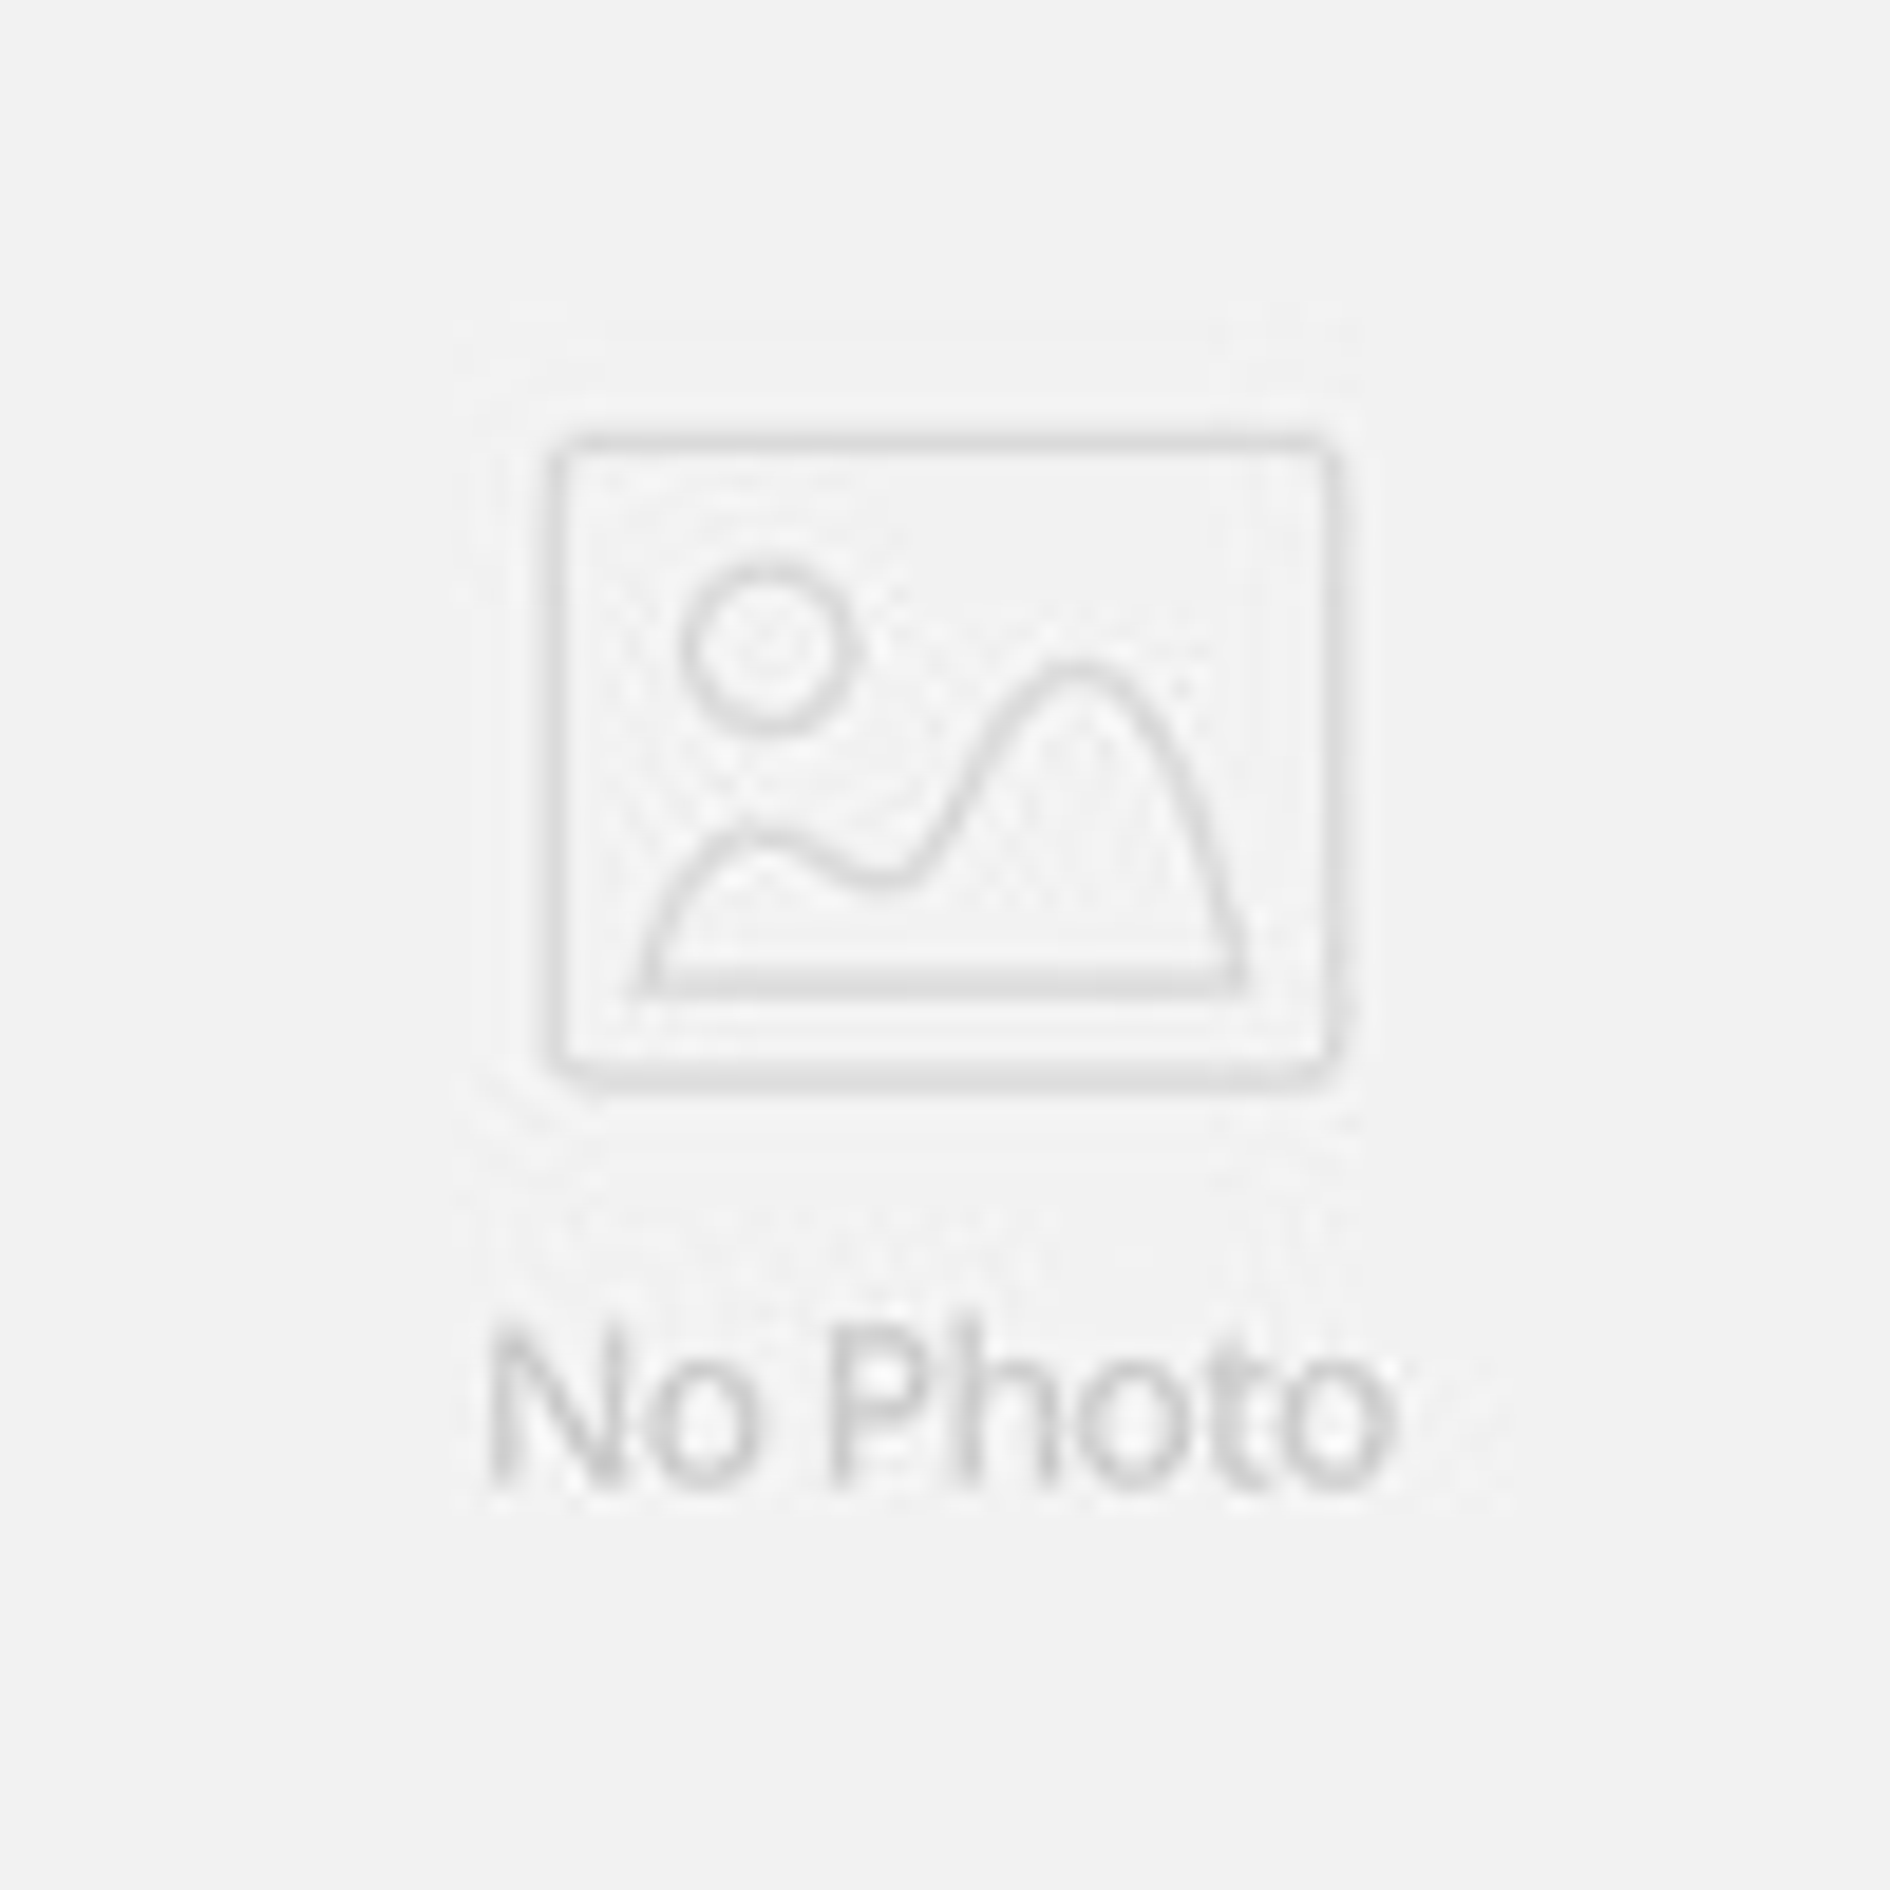 intel N2800 Atom dual-core industrial computer desktop computer case 4gb ram 128gb ssd computer accessory mini pc thin client(China (Mainland))